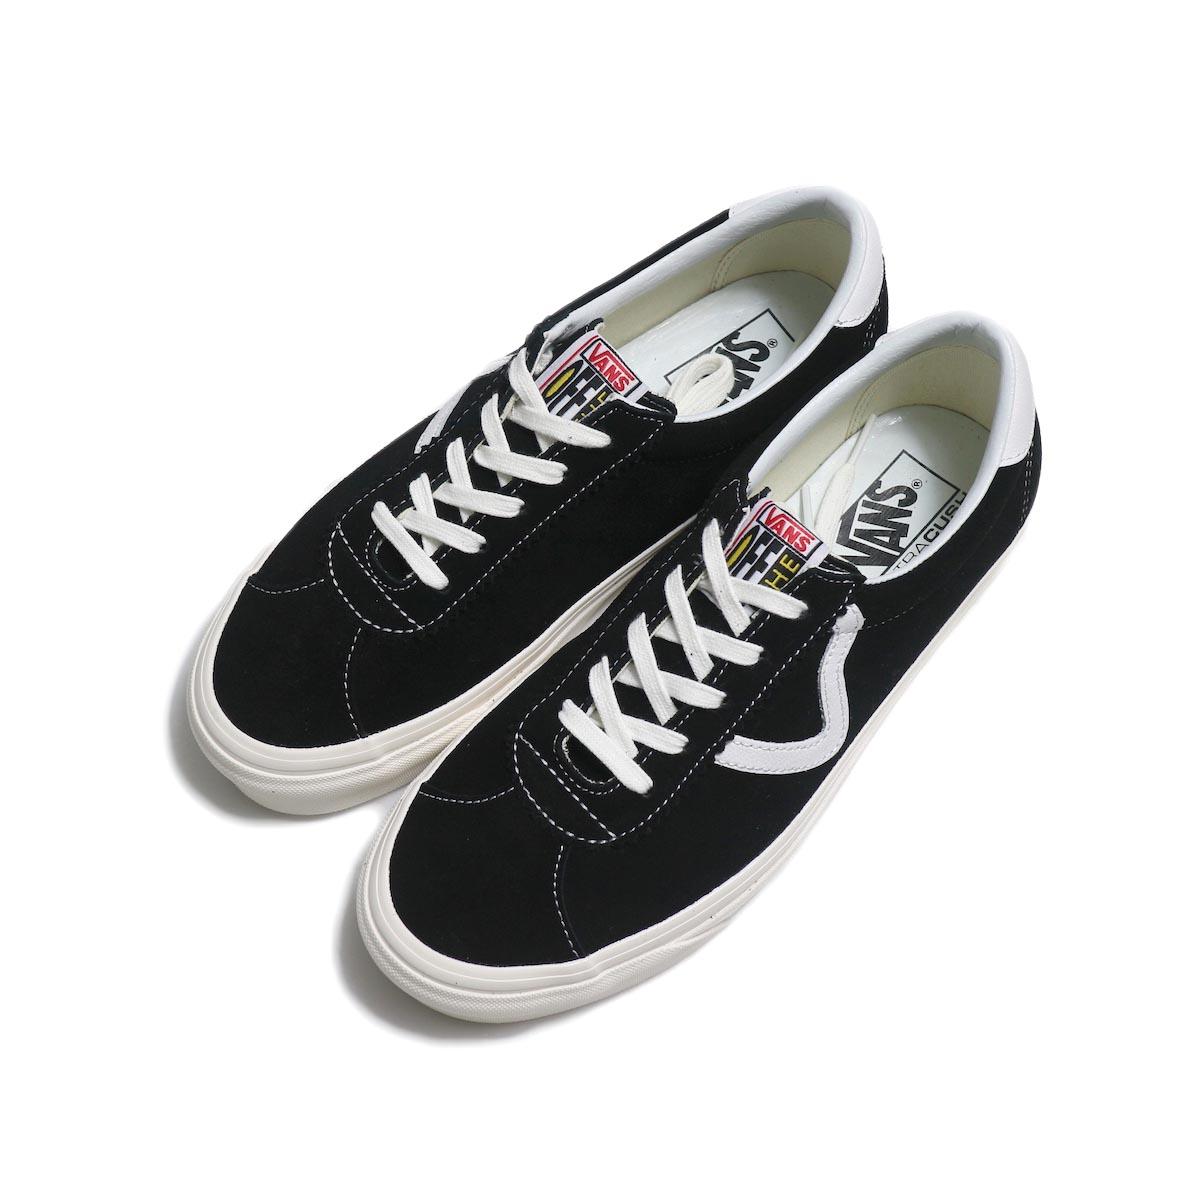 VANS / Style73 DX (ANAHEIM FACTORY)OG -Black